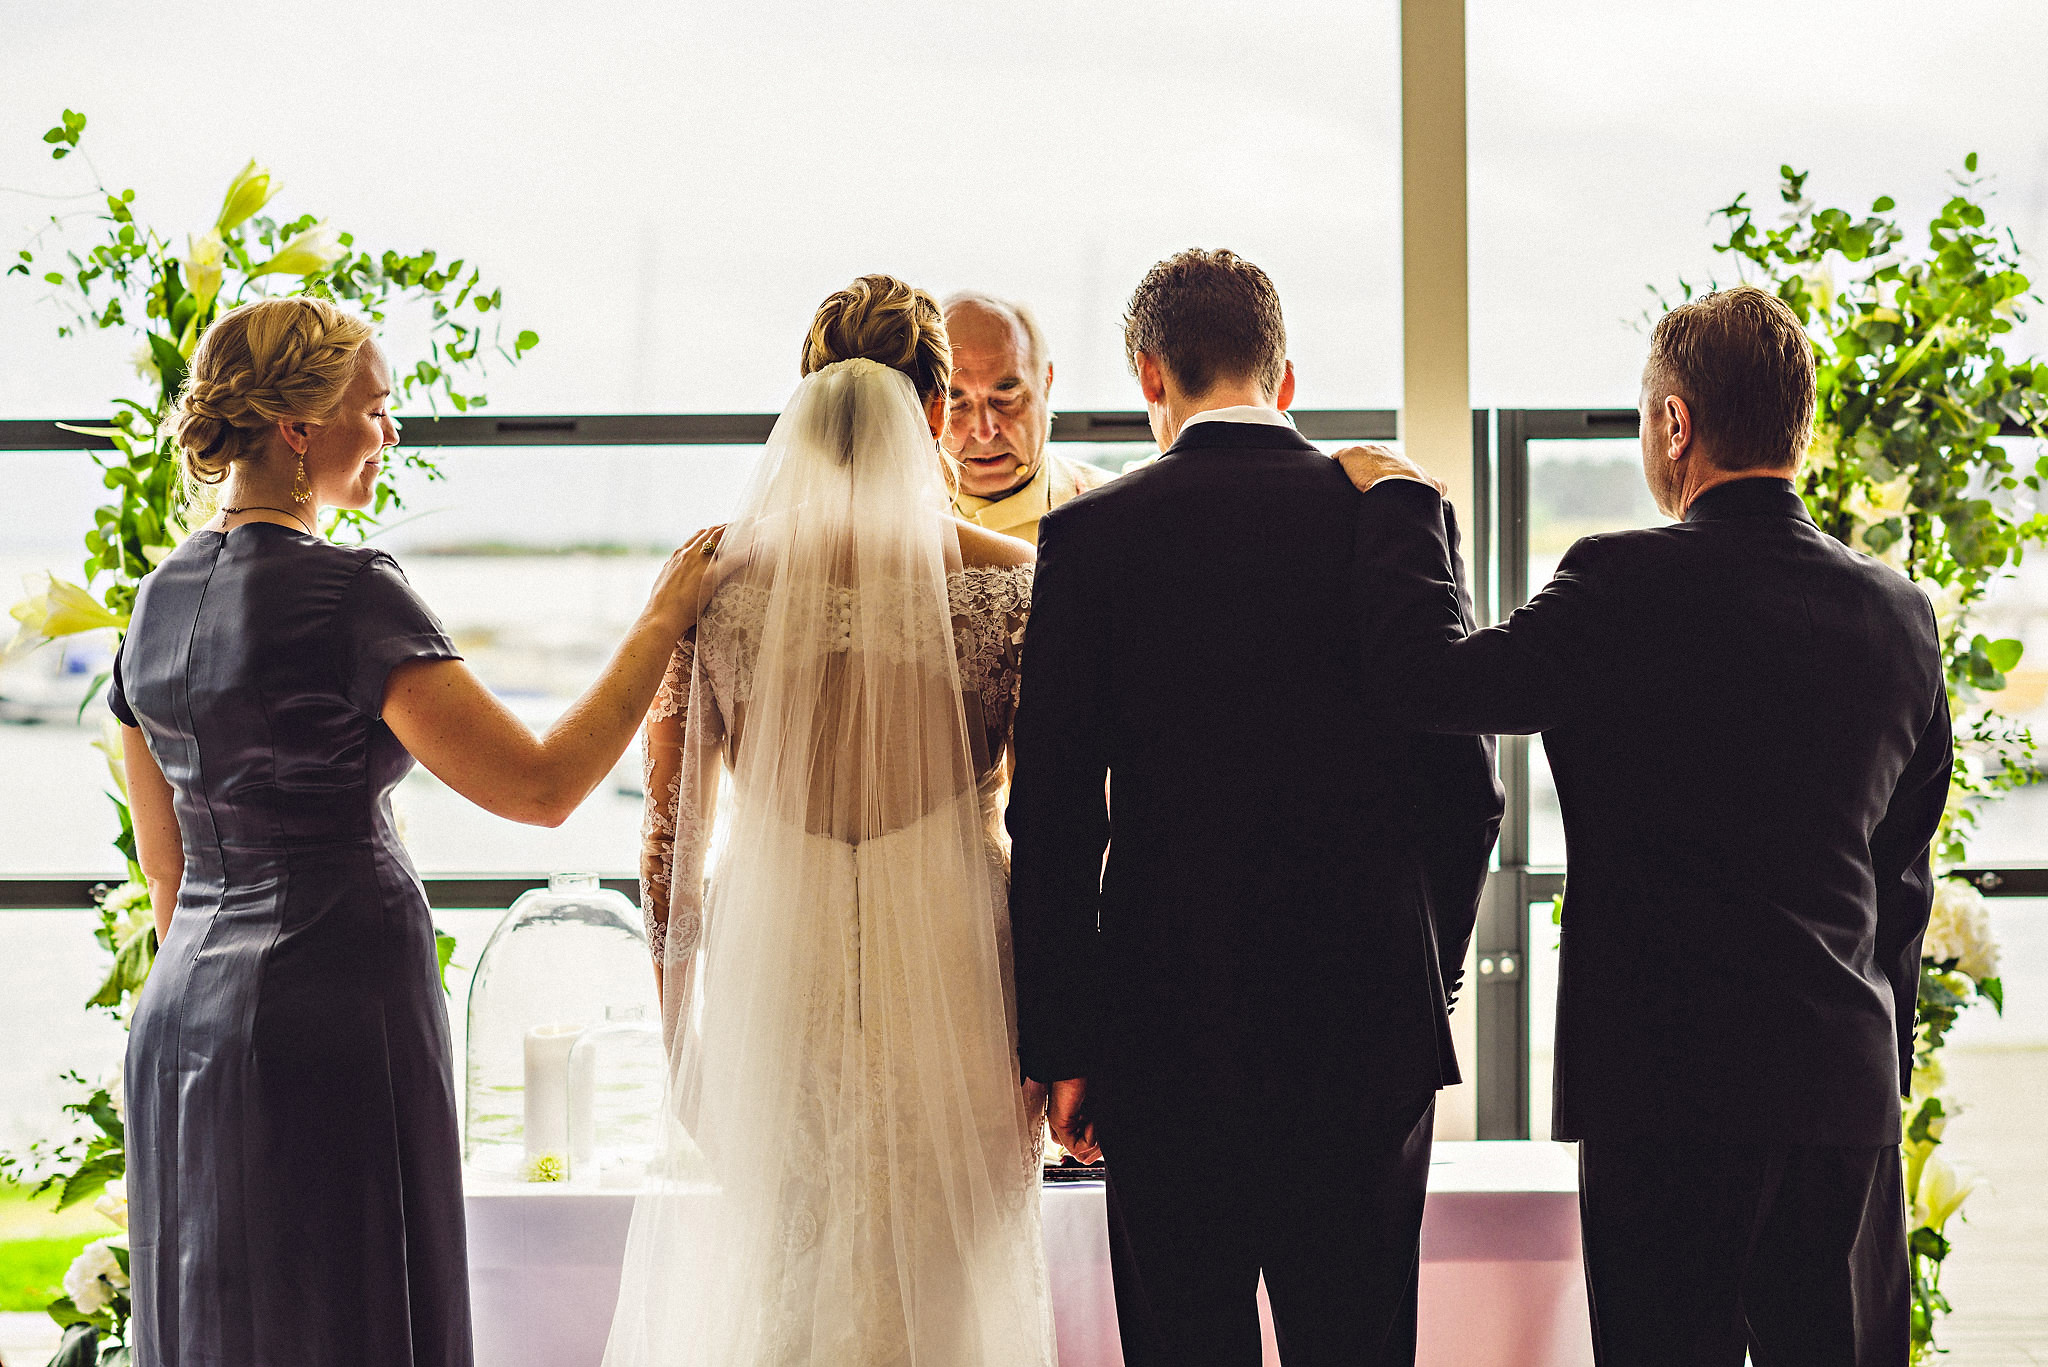 Eirik Halvorsen Henriette og Finn Ole bryllup blog-23.jpg